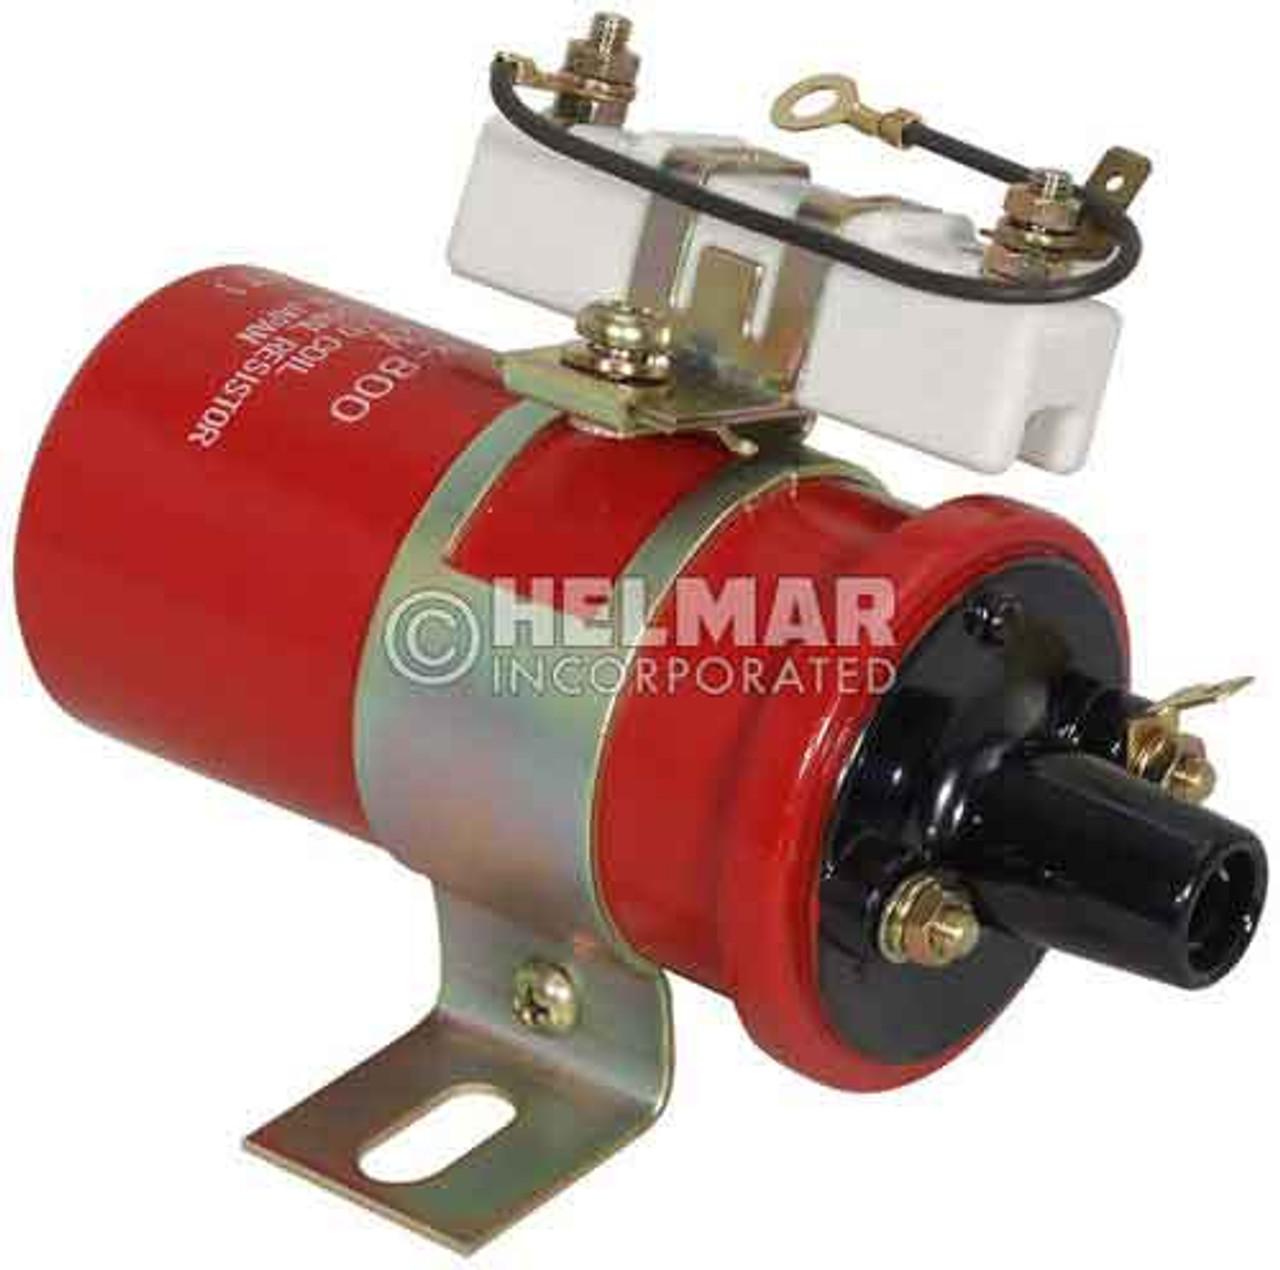 9125654-00 Yale Original Hitachi Ignition Coil, Type C 12 Volt External Resistor Included